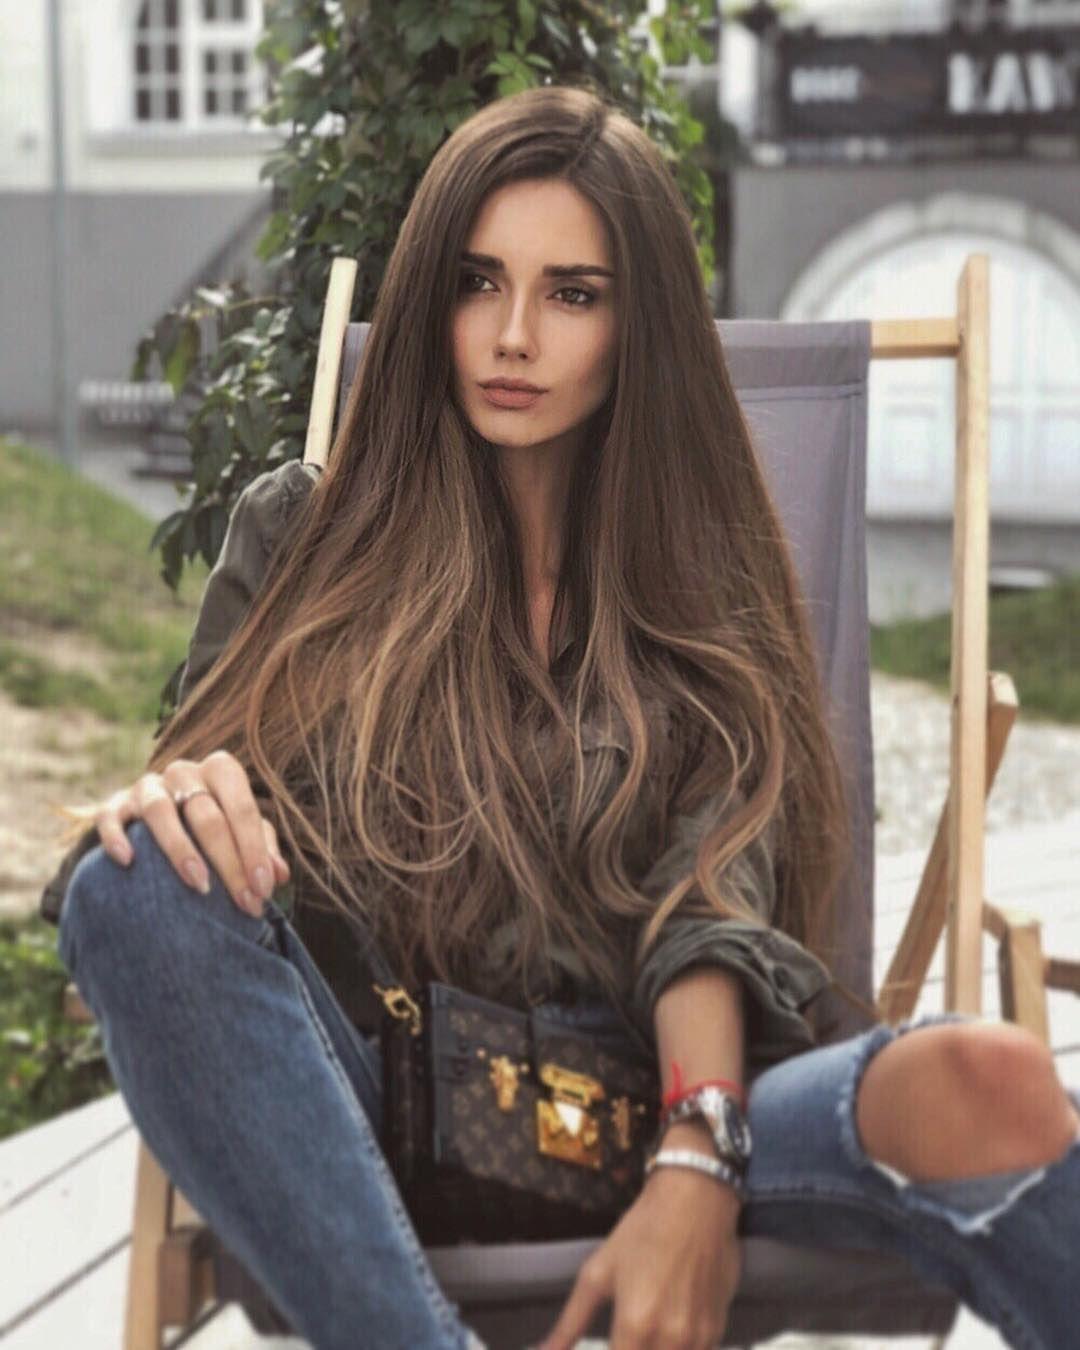 long hair brunette teen